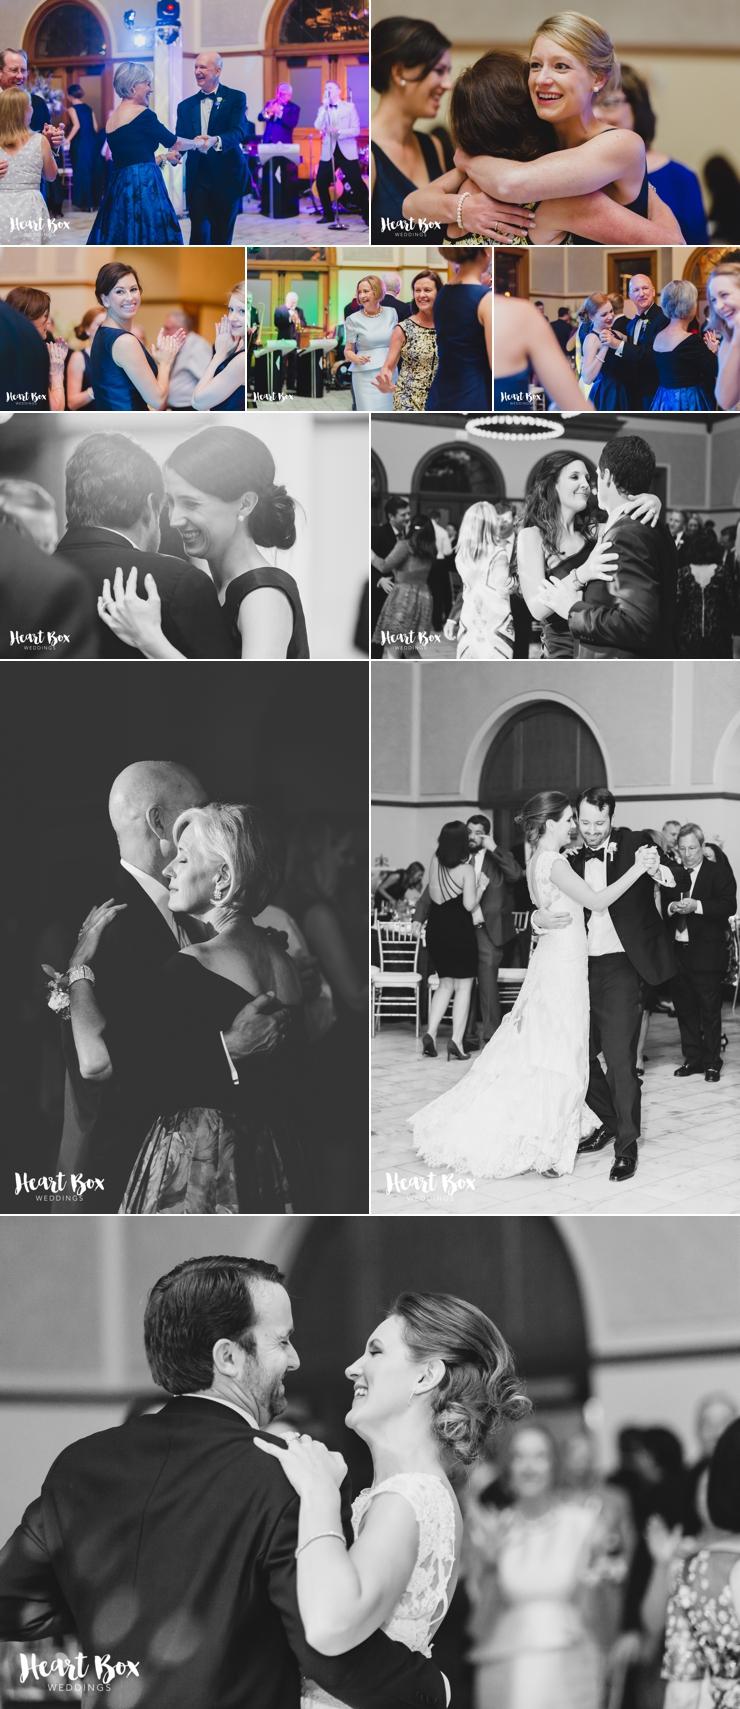 Anthony Wedding Blog Collages 22.jpg